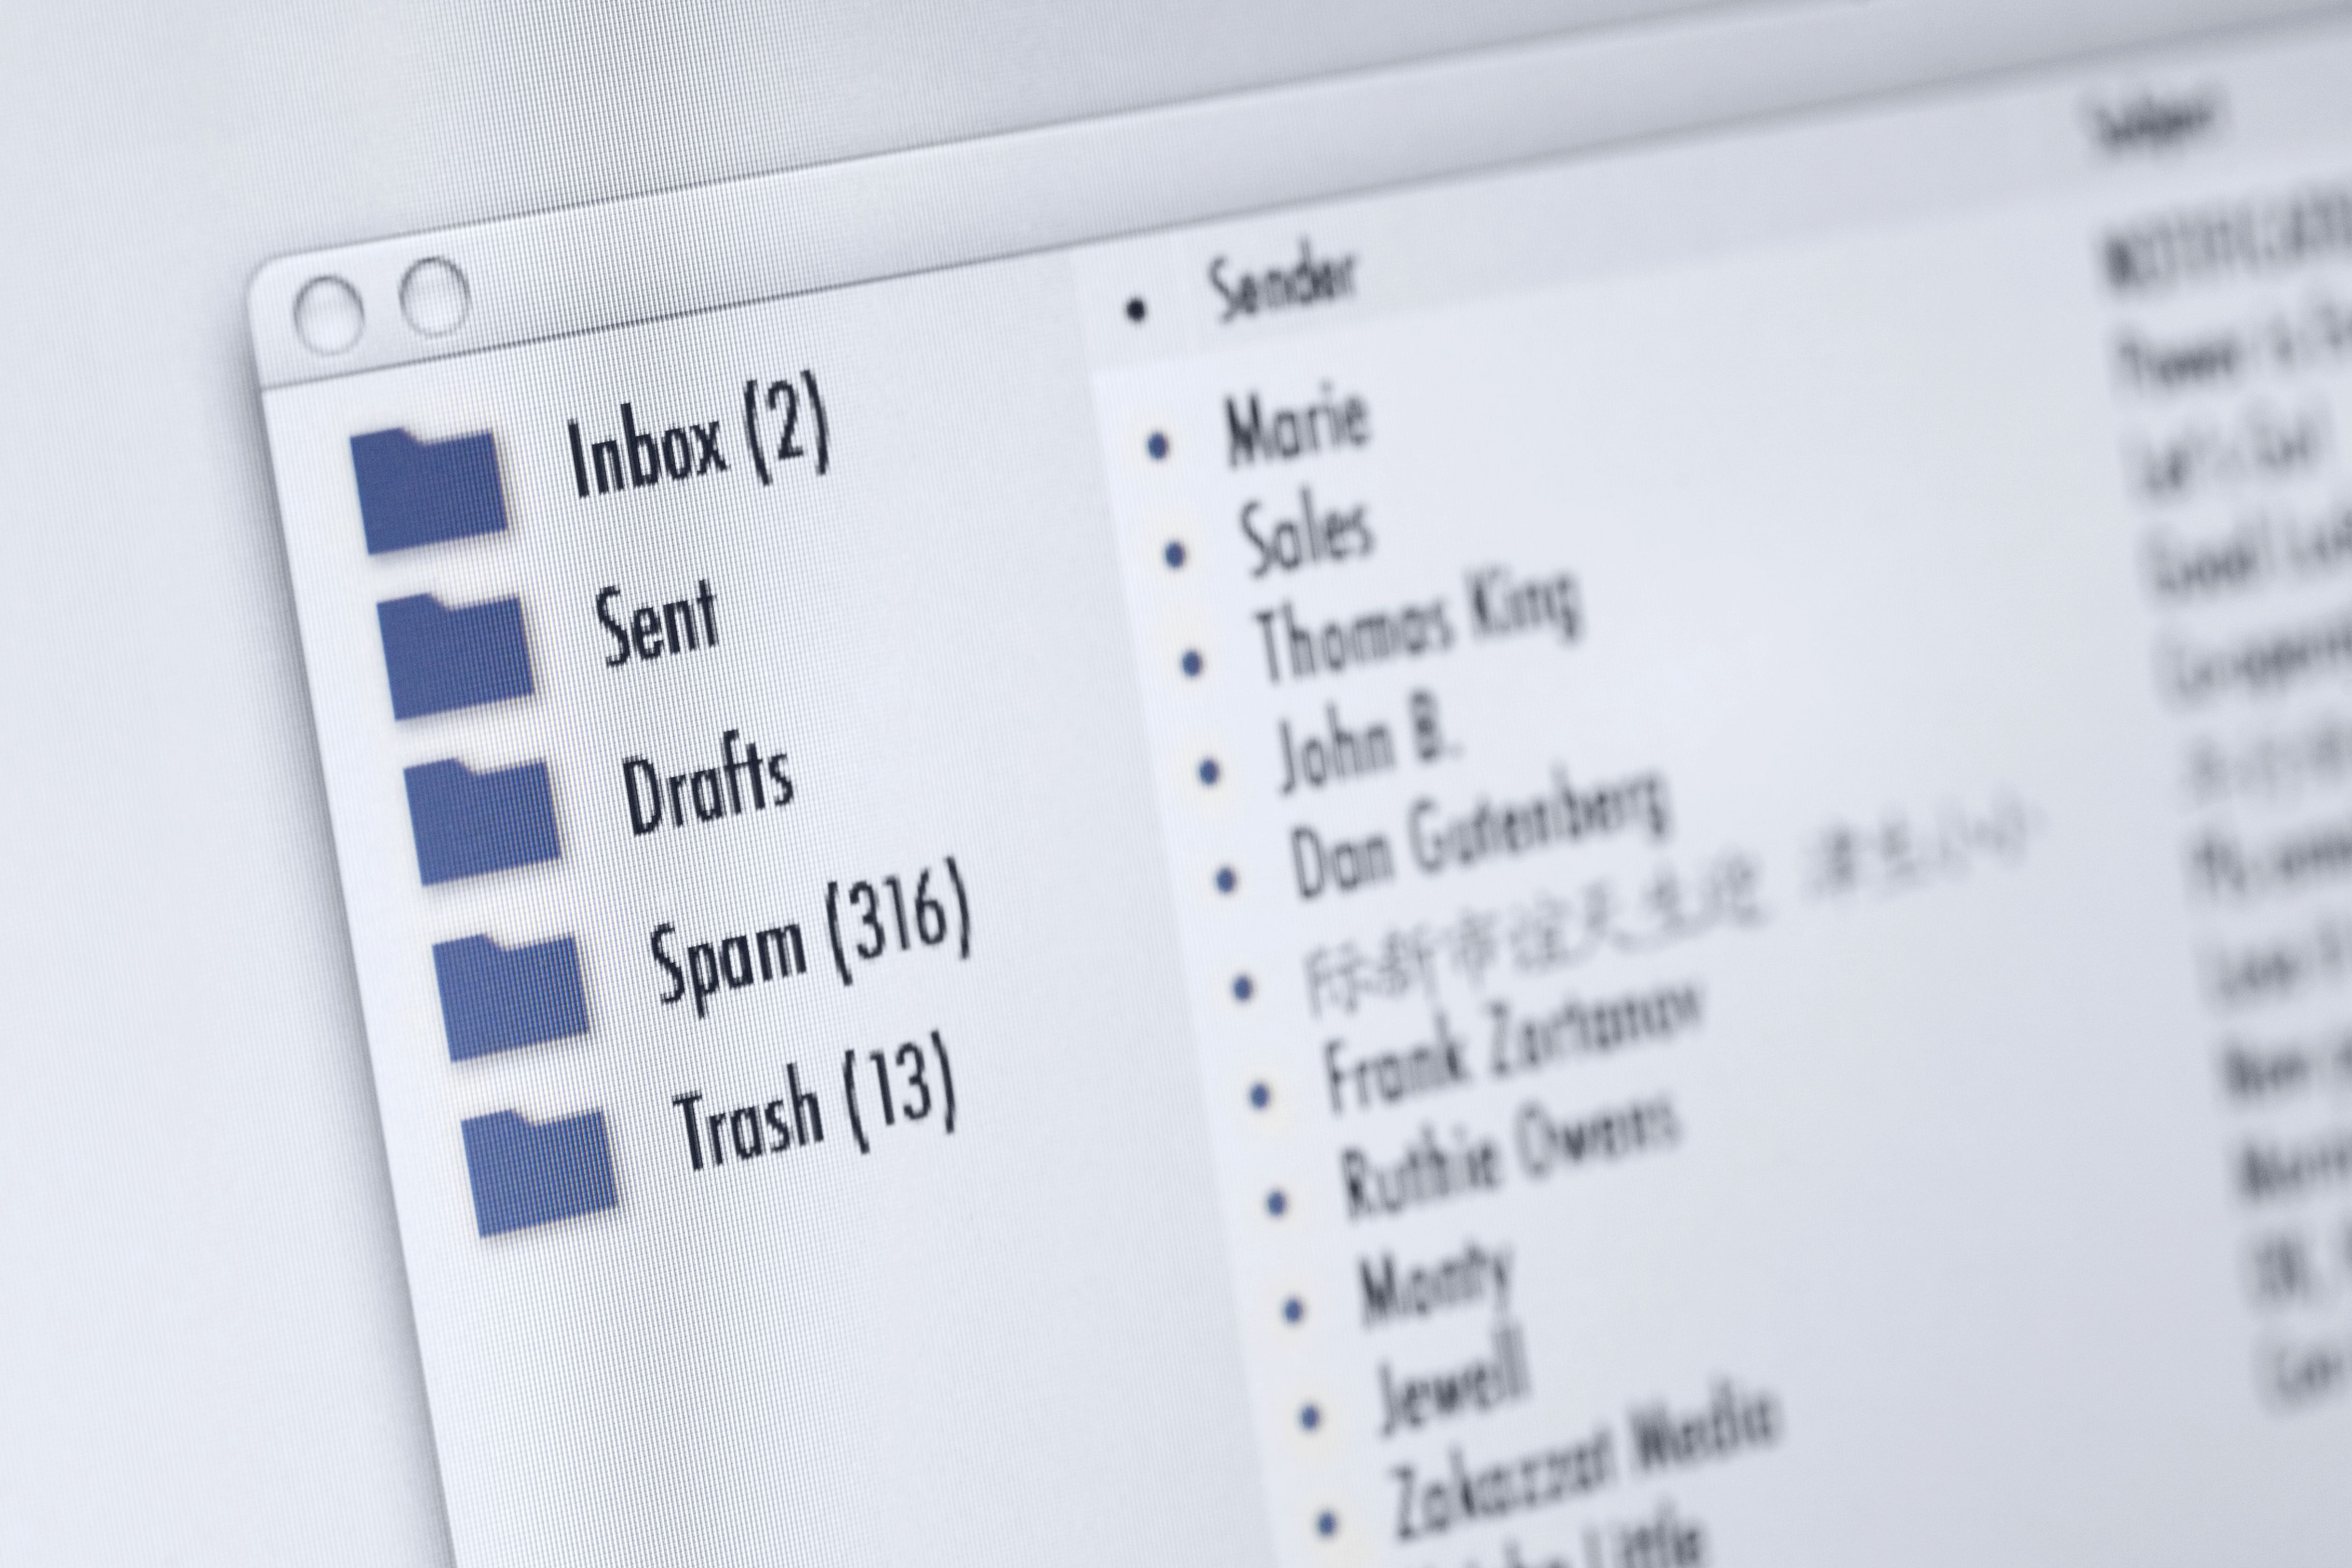 Mail program on computer screen